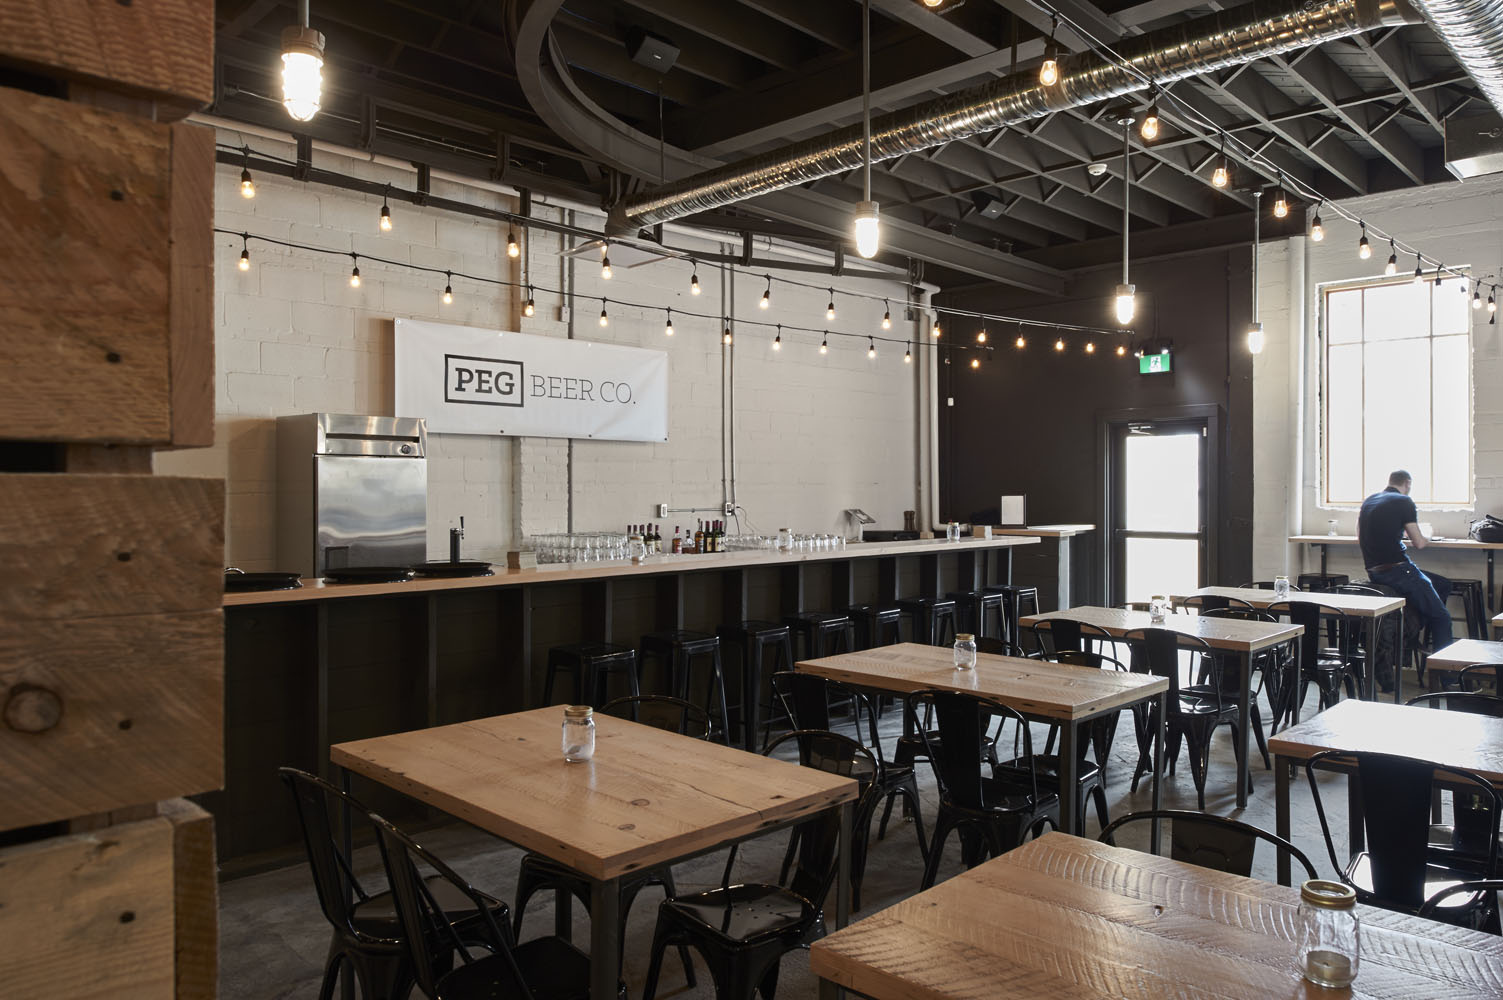 PEG Beer Interior 2 - WEB.jpg